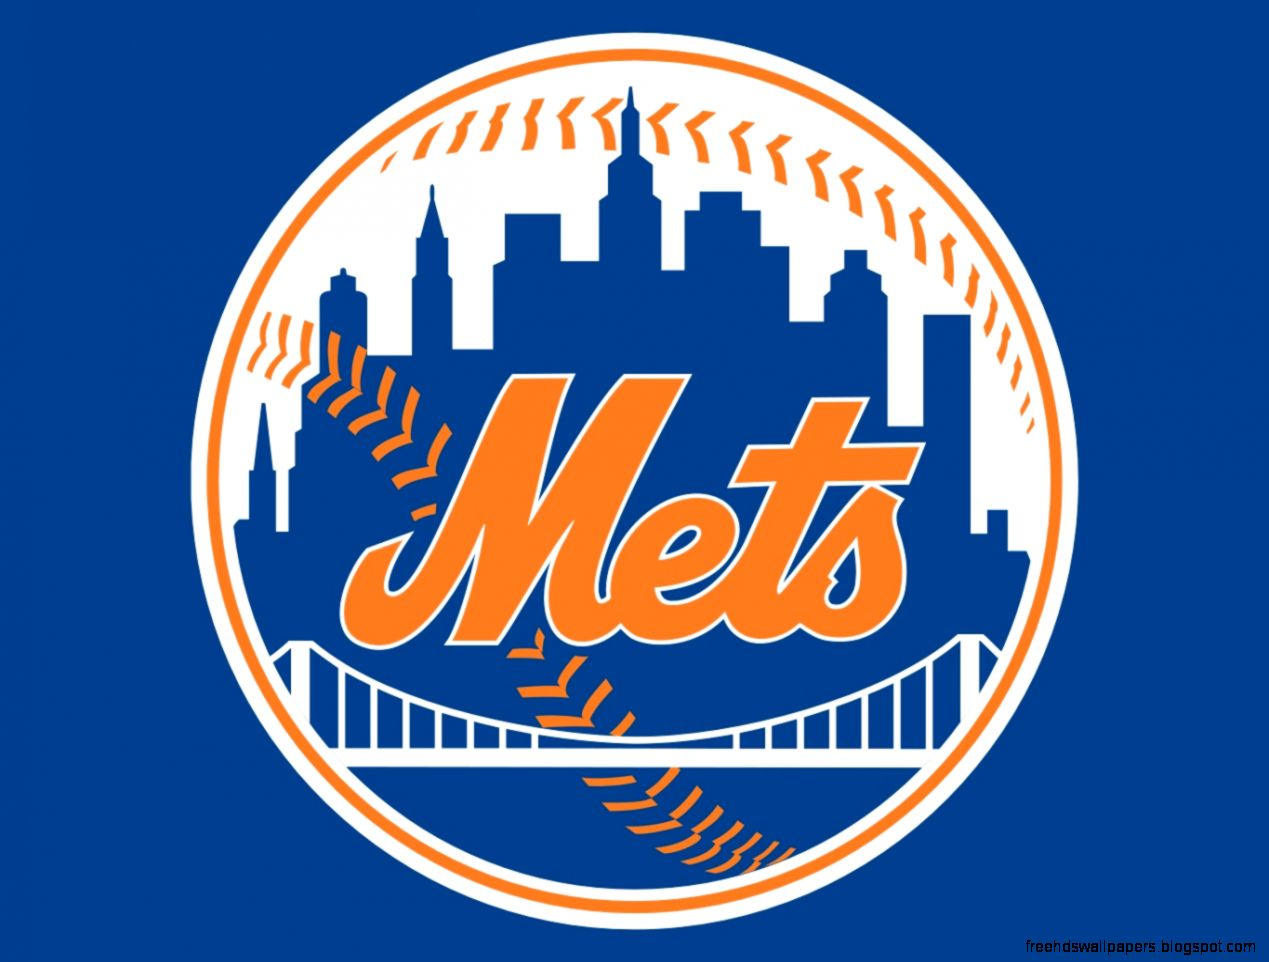 New York Mets Iphone Wallpapers Top Free New York Mets Iphone